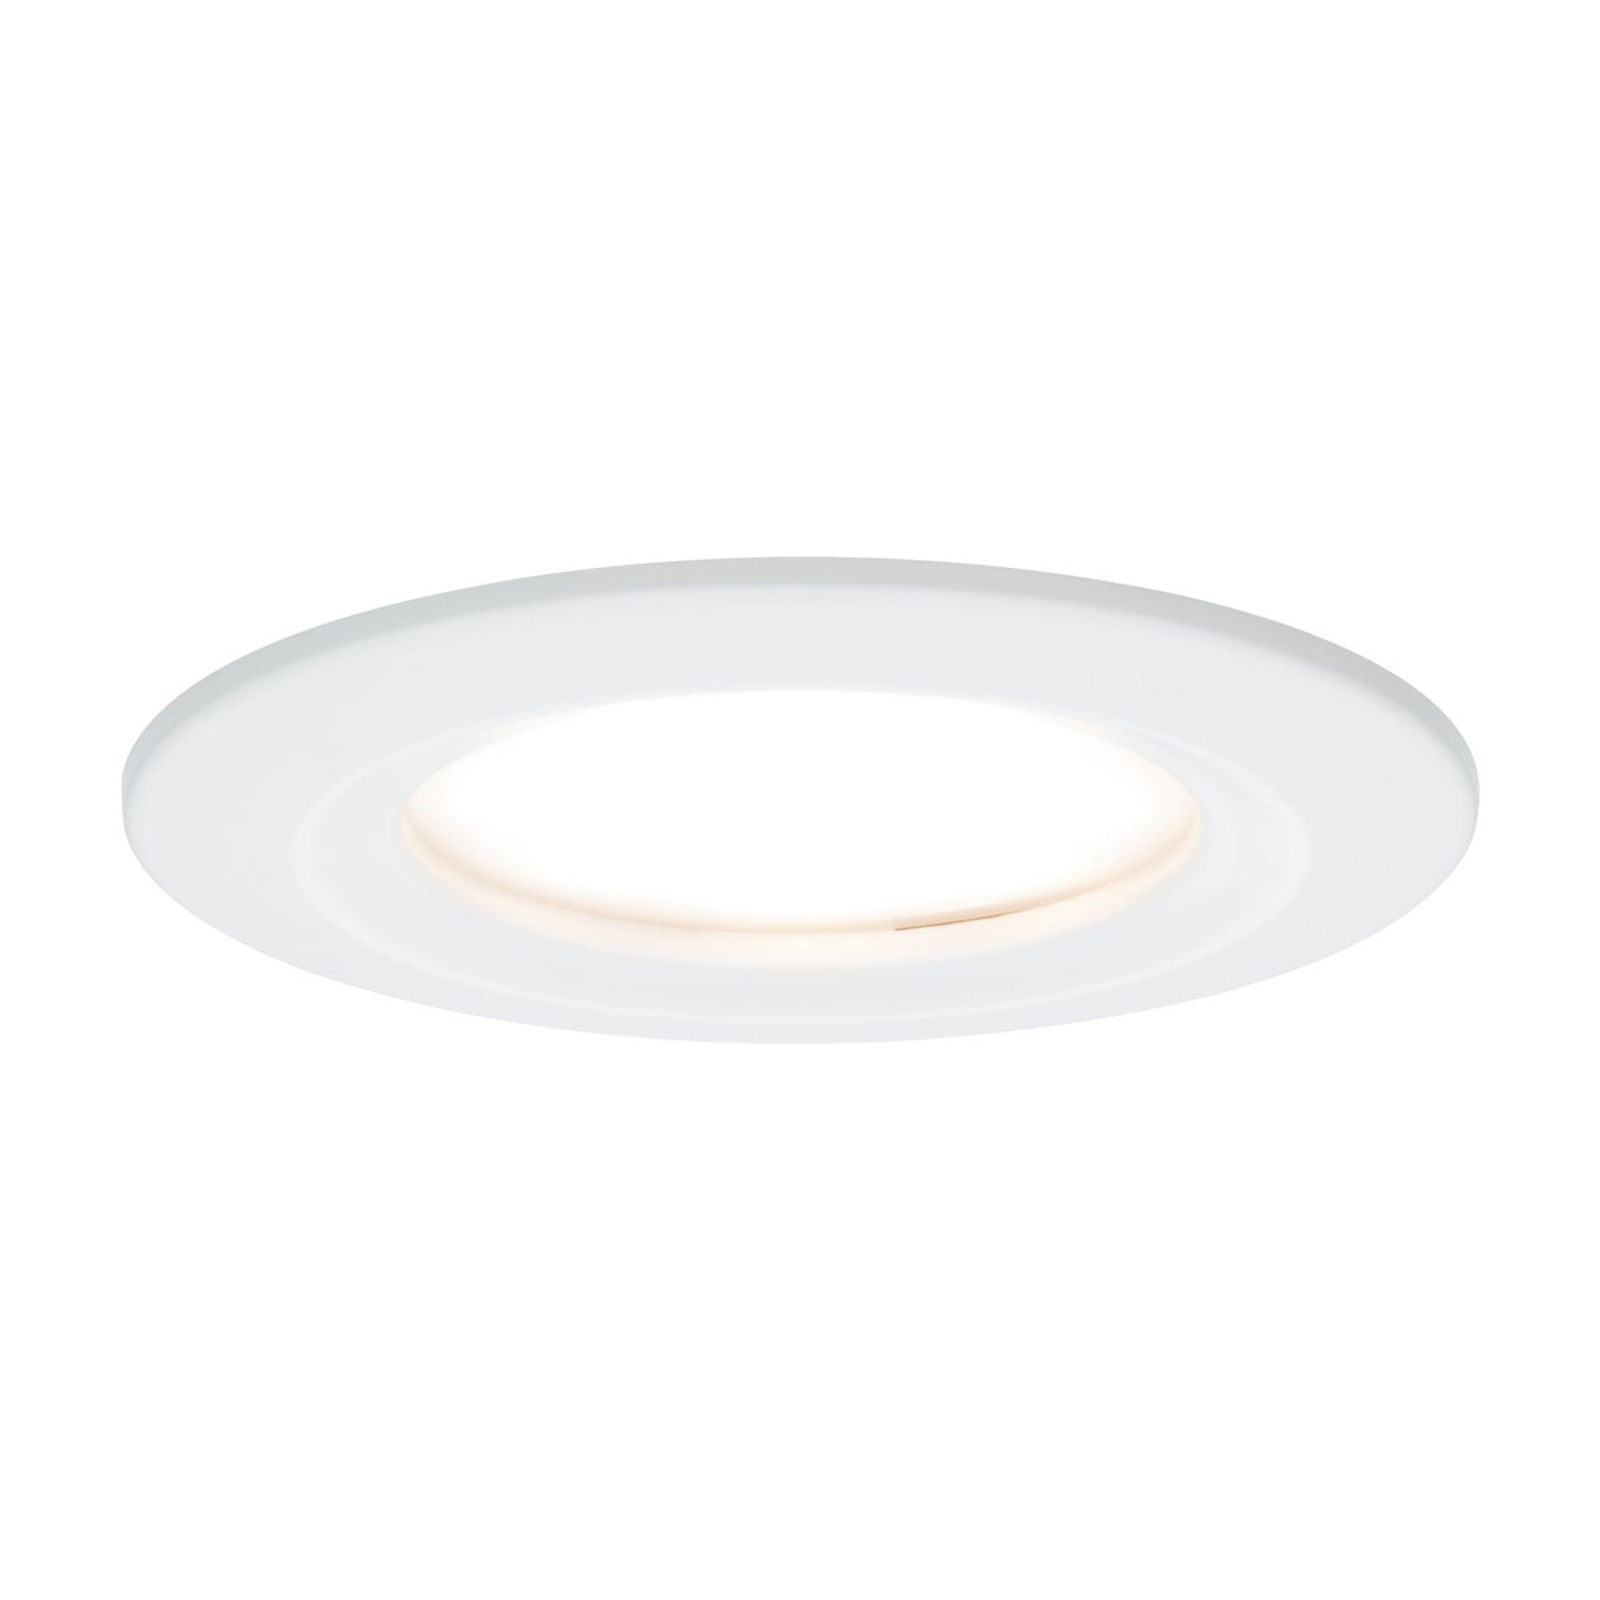 Paulmann LED-Spot Nova Coin rund, dimmbar, weiß